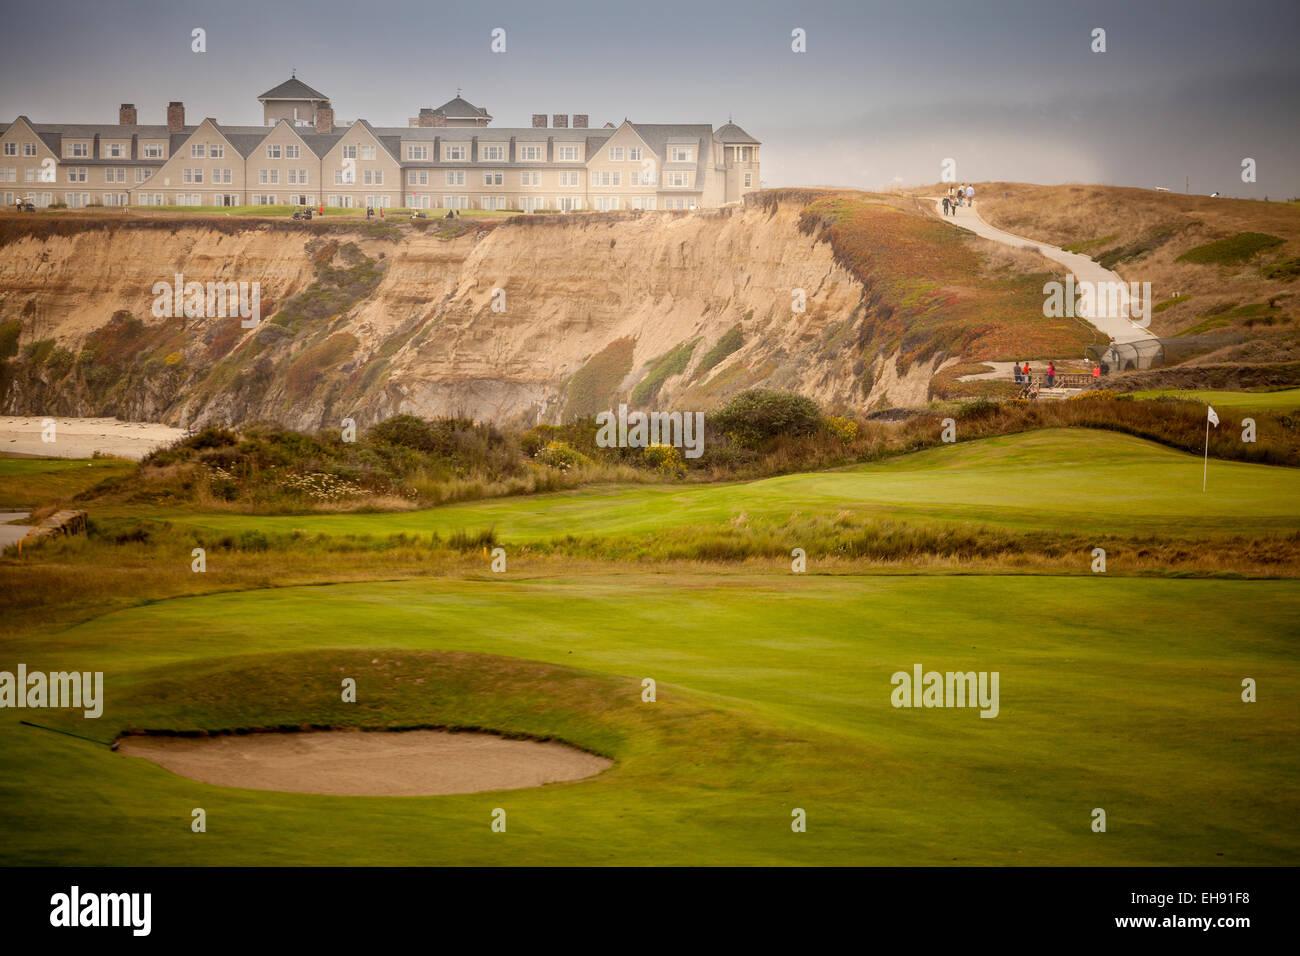 Ritz-Carlton Hotel and Half Moon Bay Ocean Golf Links on a misty day, Half Moon Bay, California - Stock Image